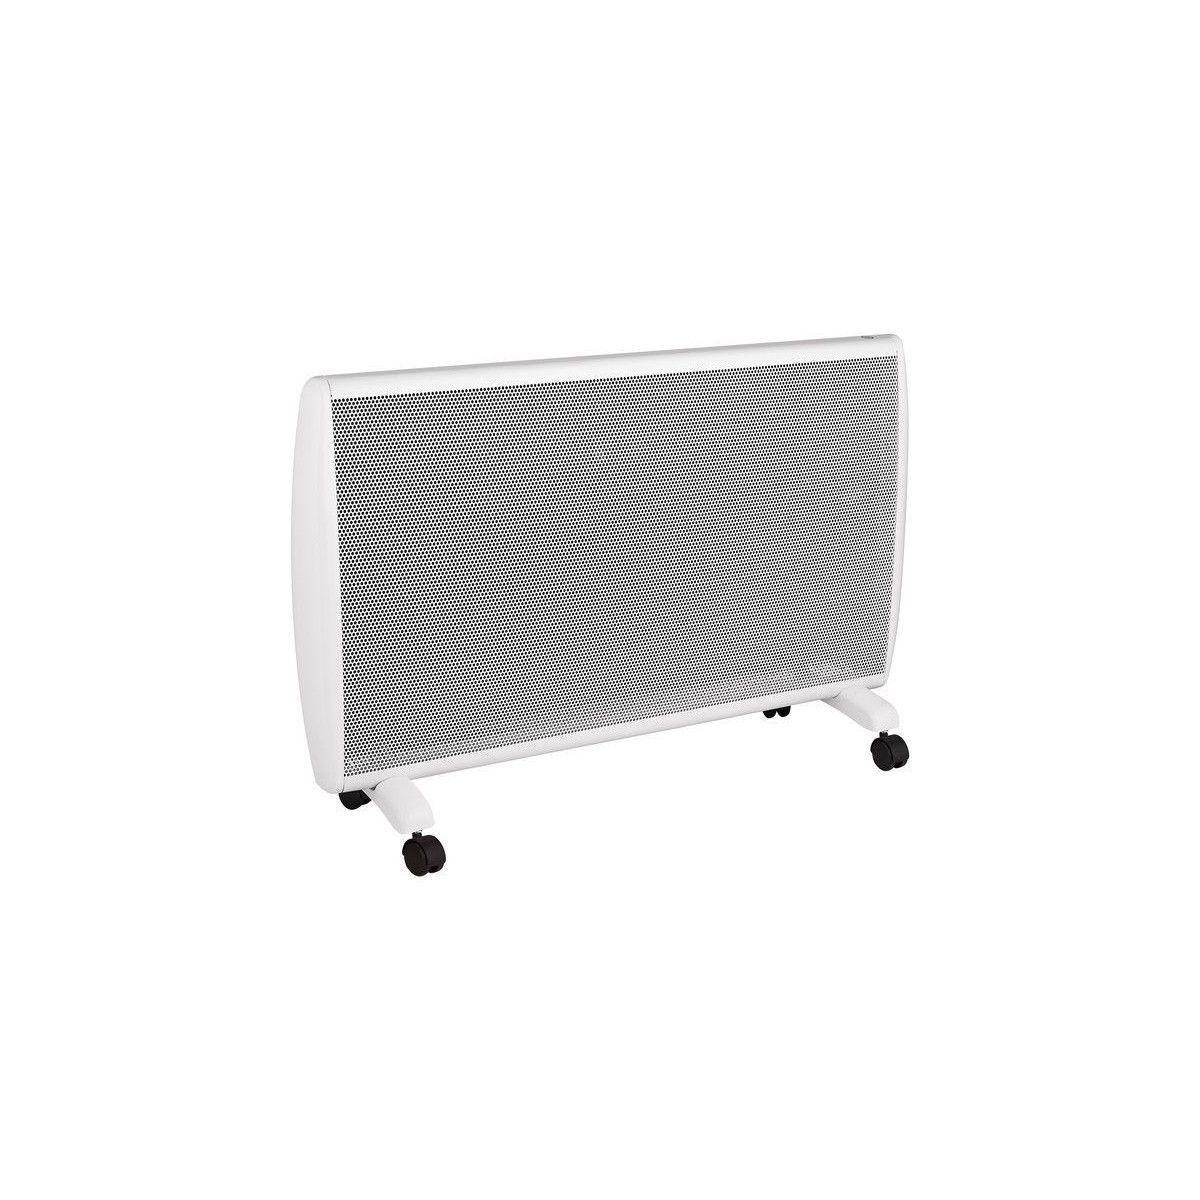 Haverland Panneau Rayonnant Mobile Haverland Anubis-10 1000 W (blanc)